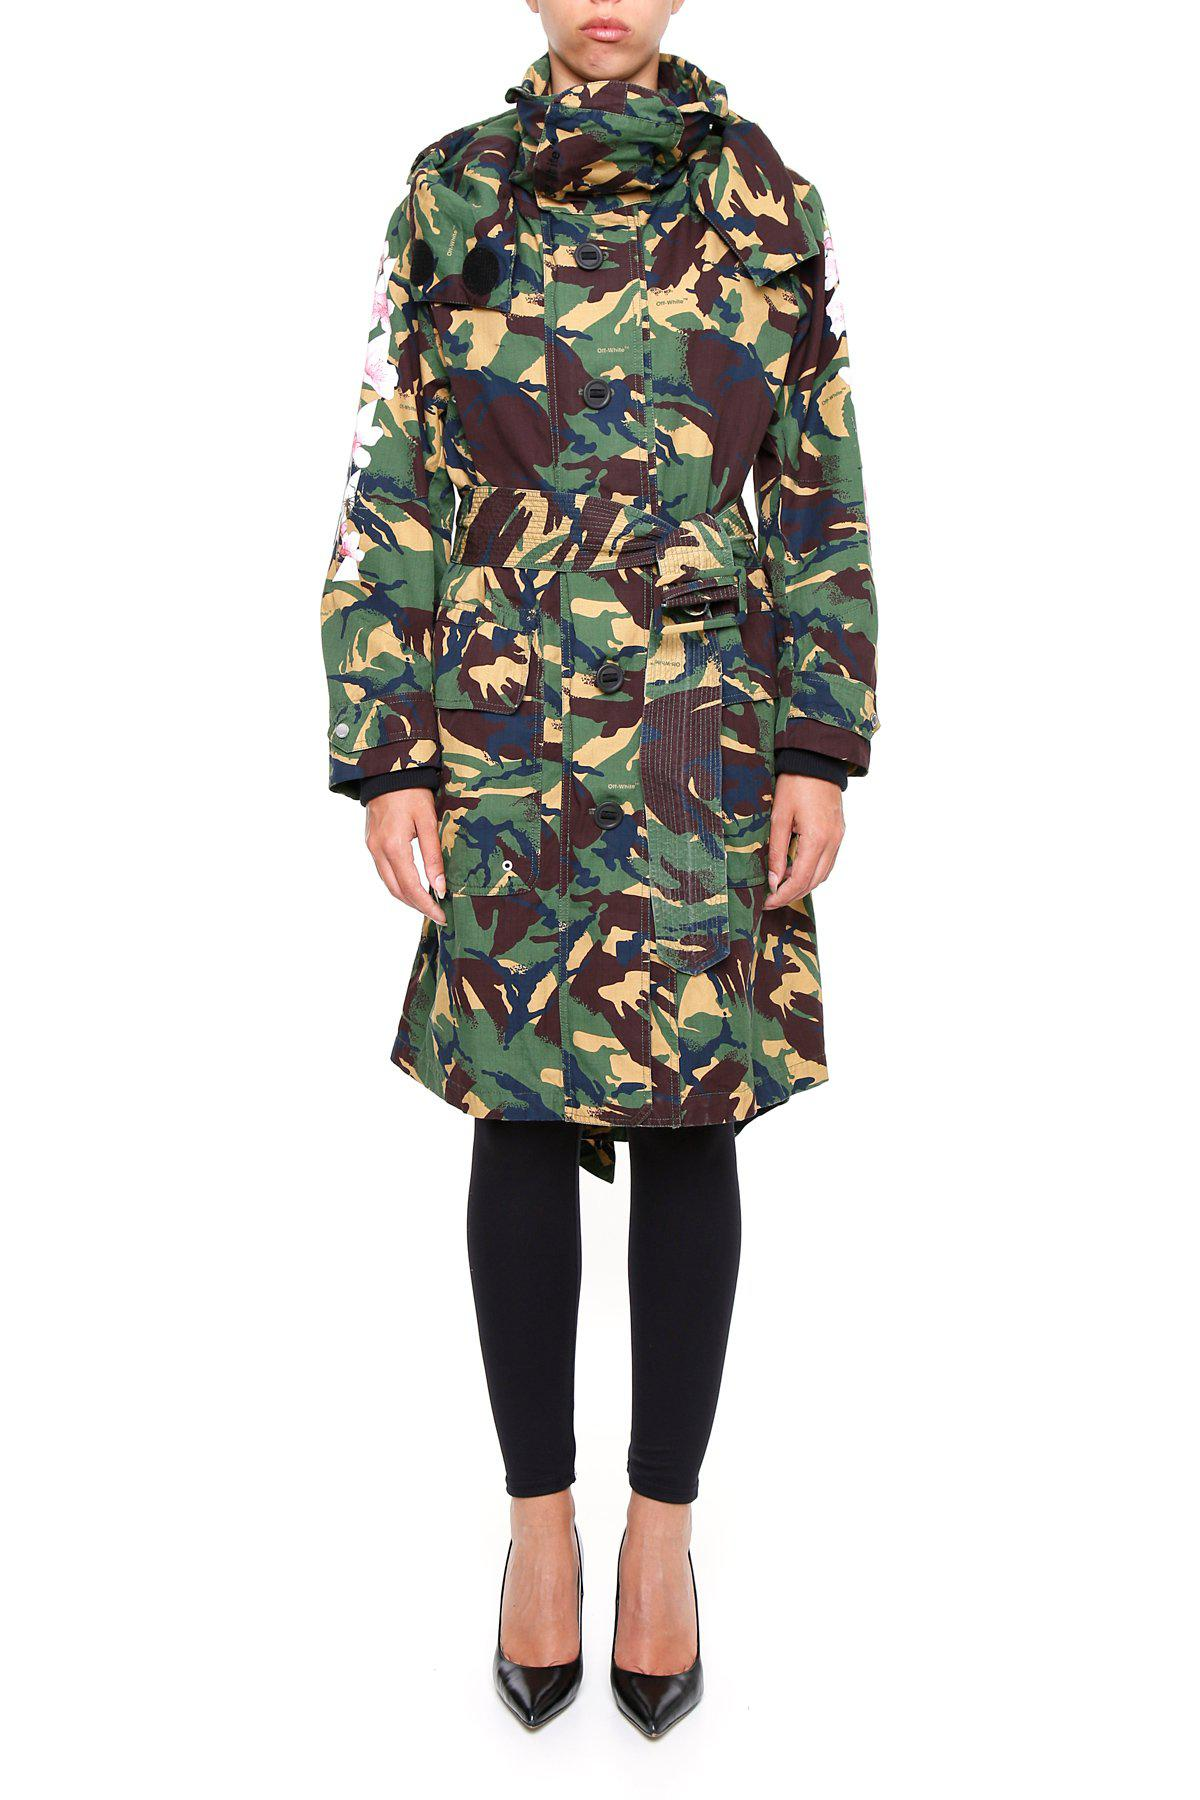 e36f0b73bd524 Lyst - Off-White c/o Virgil Abloh Camouflage Parka Coat